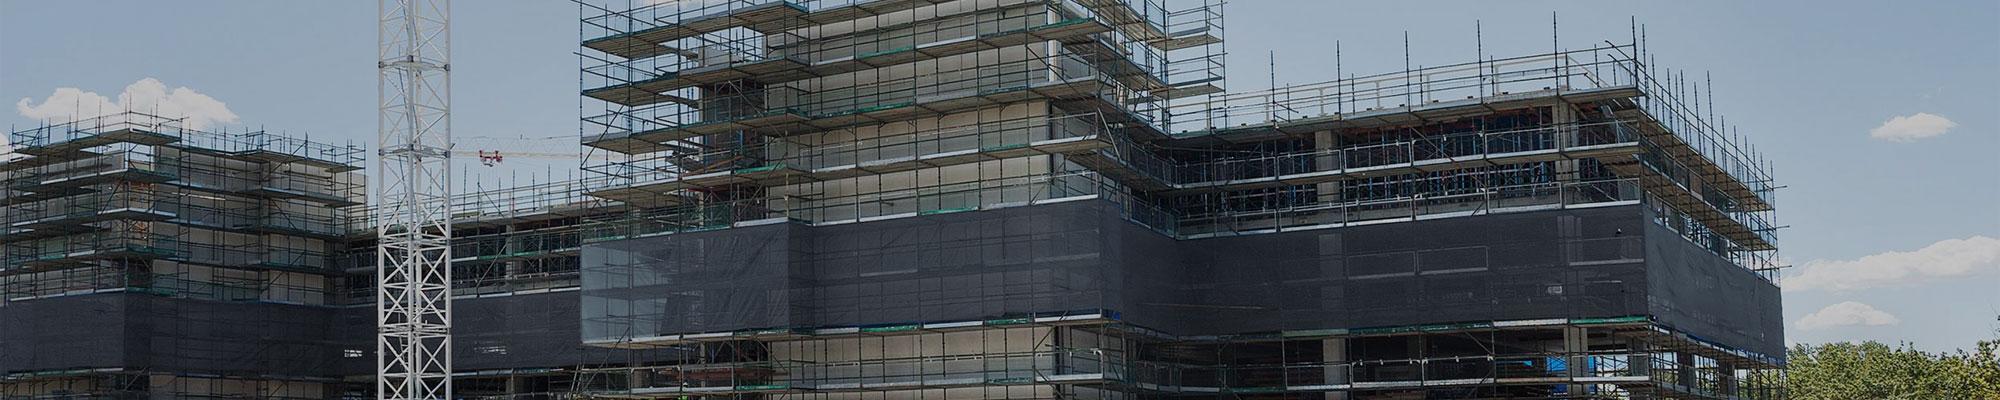 Scaffolding for Hire - Scaffolding Company - Greater London - BT Scaffolding